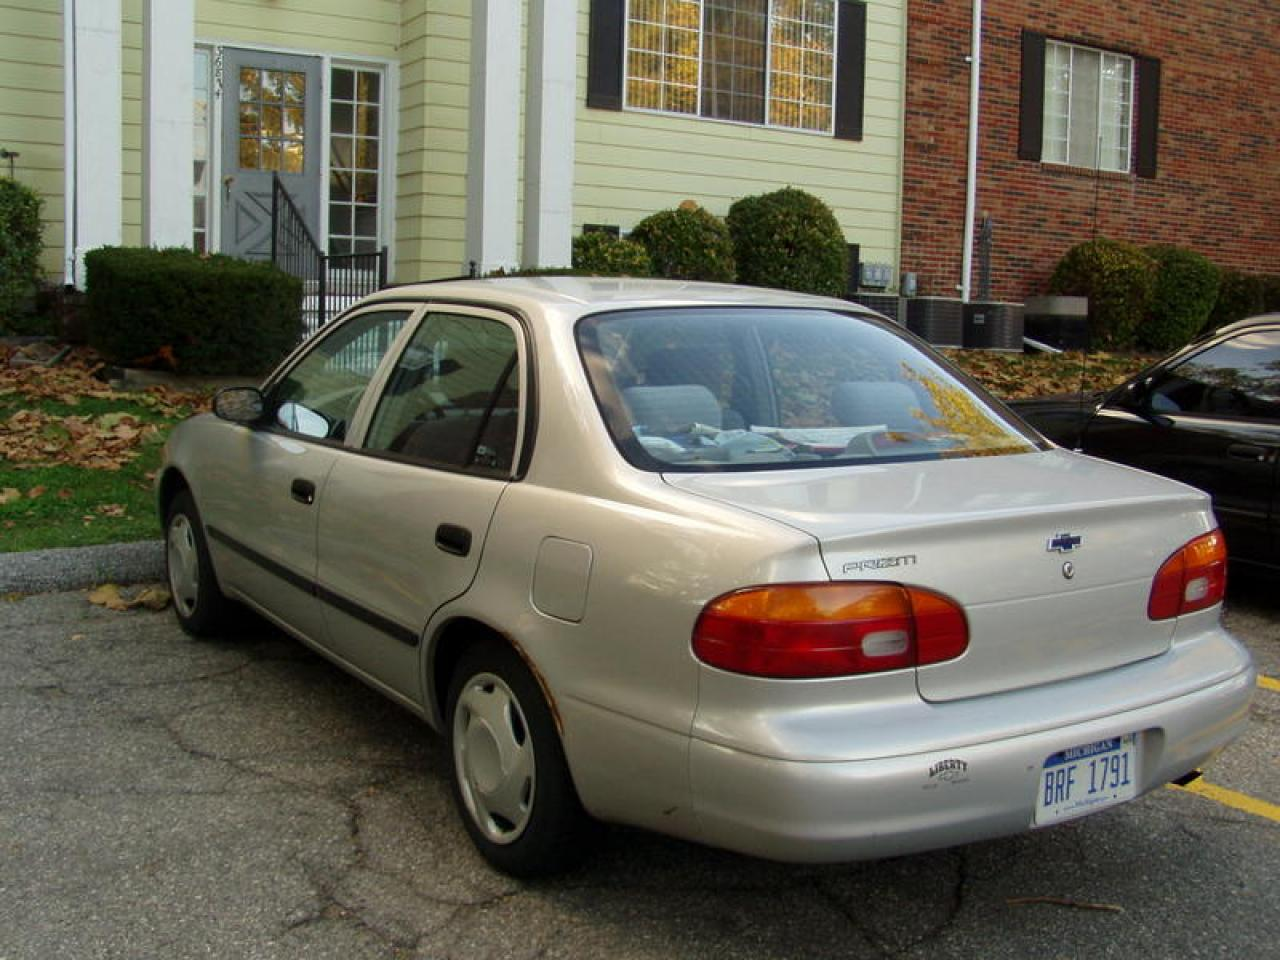 Chevrolet Prizm 2002 2002 geo prizm related keywords & suggestions